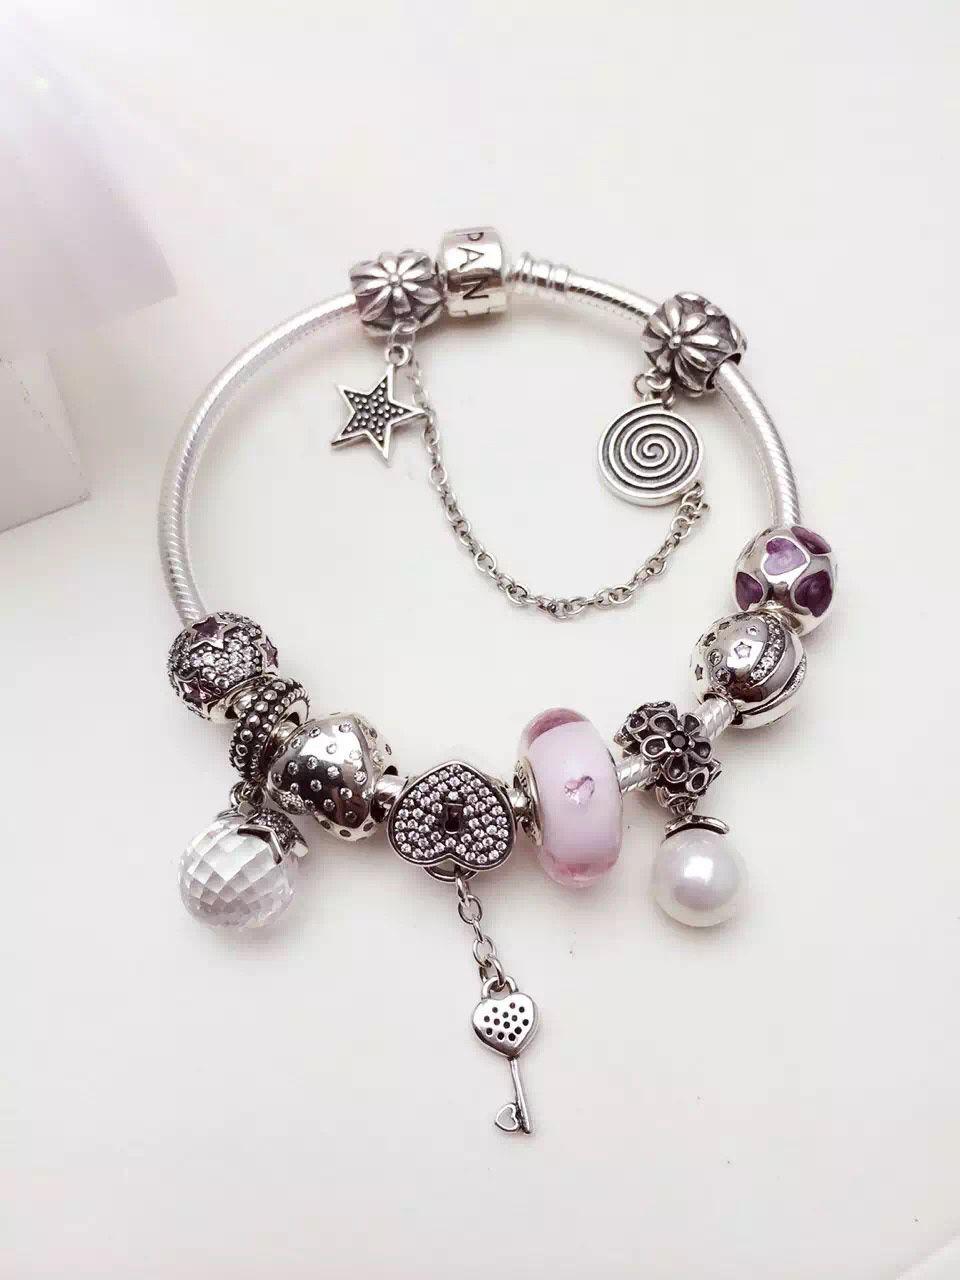 1db41594c $239 Pandora Charm Bracelet White Pink. Hot Sale!!! SKU: CB01700 - PANDORA  Bracelet Ideas